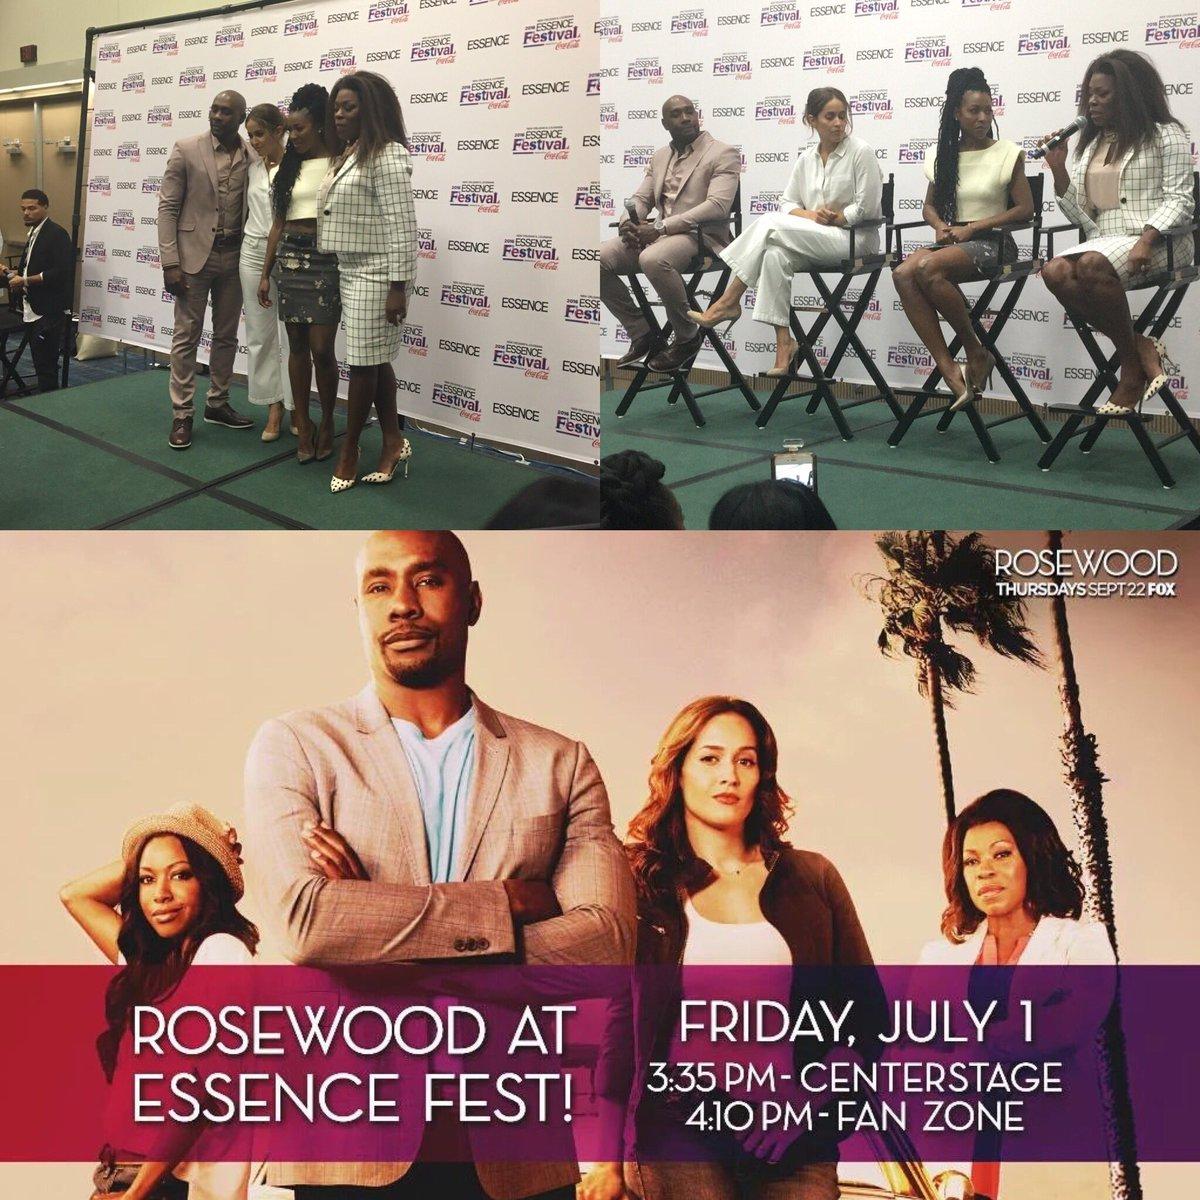 @RosewoodFOX @Morris_Chestnut @GabrielleDennis @JainaLeeOrtiz @LPToussaint @essencefest today #Rosewood #EssenceFest https://t.co/1623NqARfP